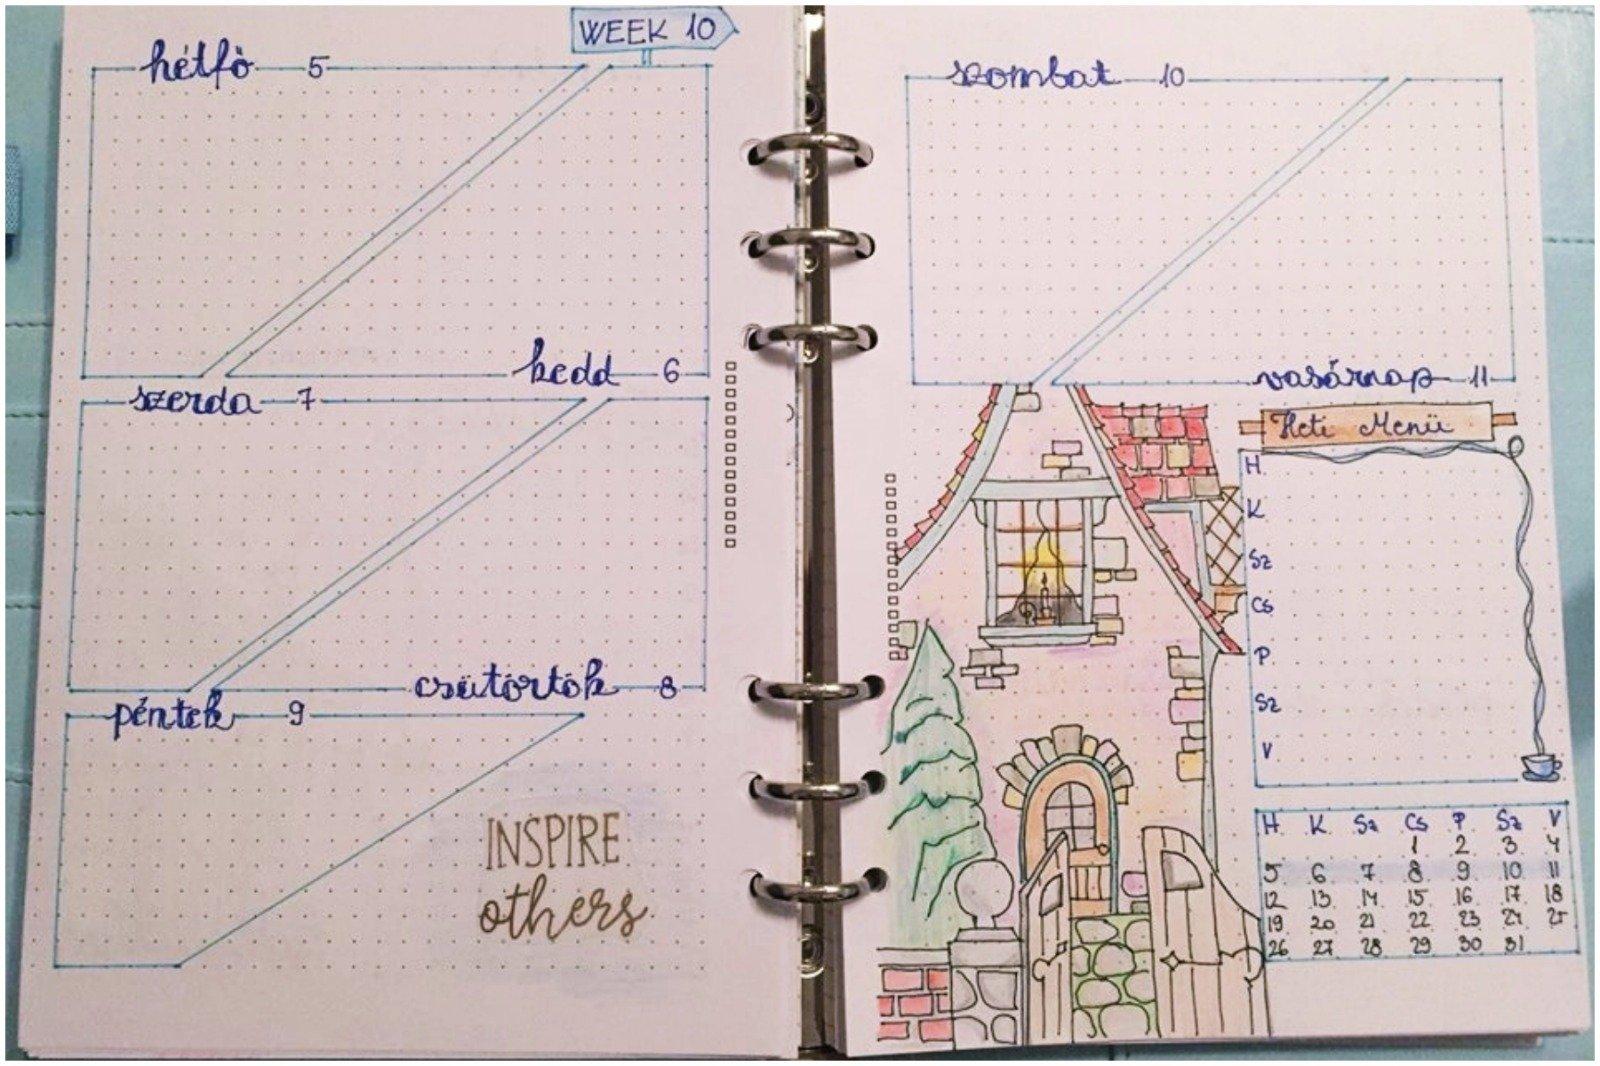 Bullet journal weekly planner - week 10 - itstartswithacoffee.com #march #coverpage #bulletjournal #bujo #weekly #weeklyplanner #bulletjournaling #bujojunkies #bujolove #showmeyourplanner #bujoinspire #bulletjournallove #bulletjournalcommunity #planning #planneraddict #bulletjournaljunkies #planwithme #itstartswithacoffee.com